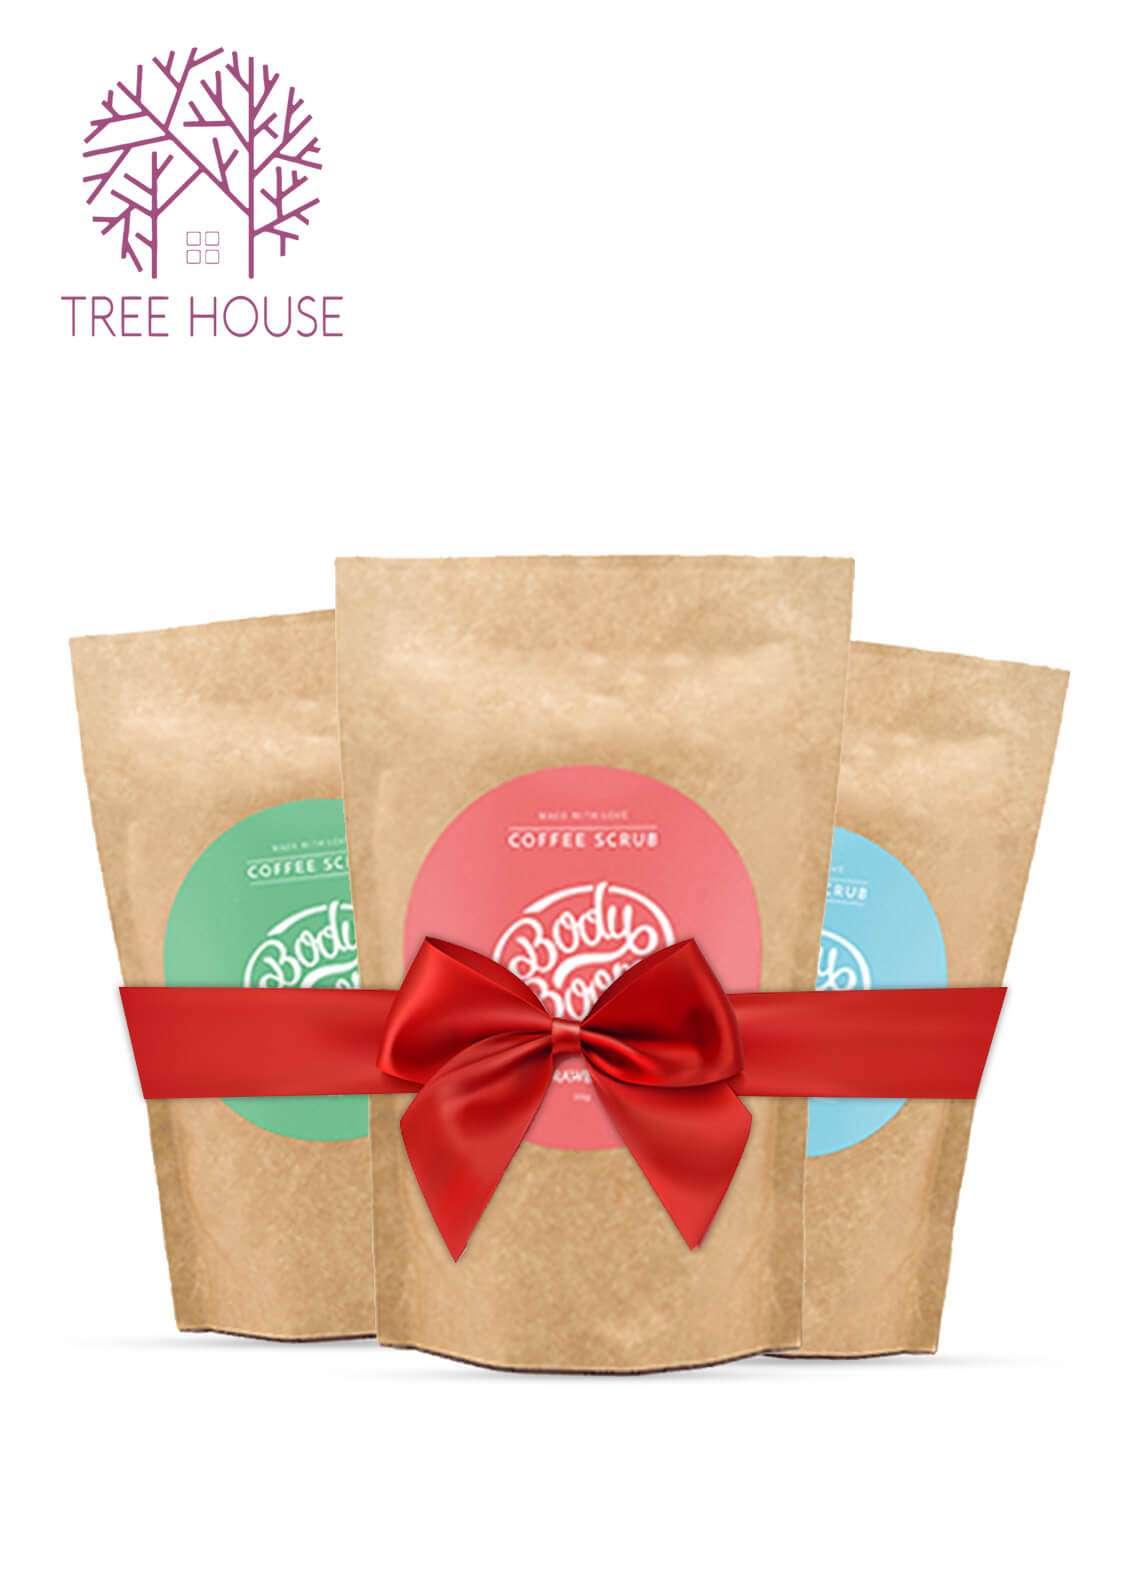 Body Boom Coffee Scrub (Promo pack of 3)